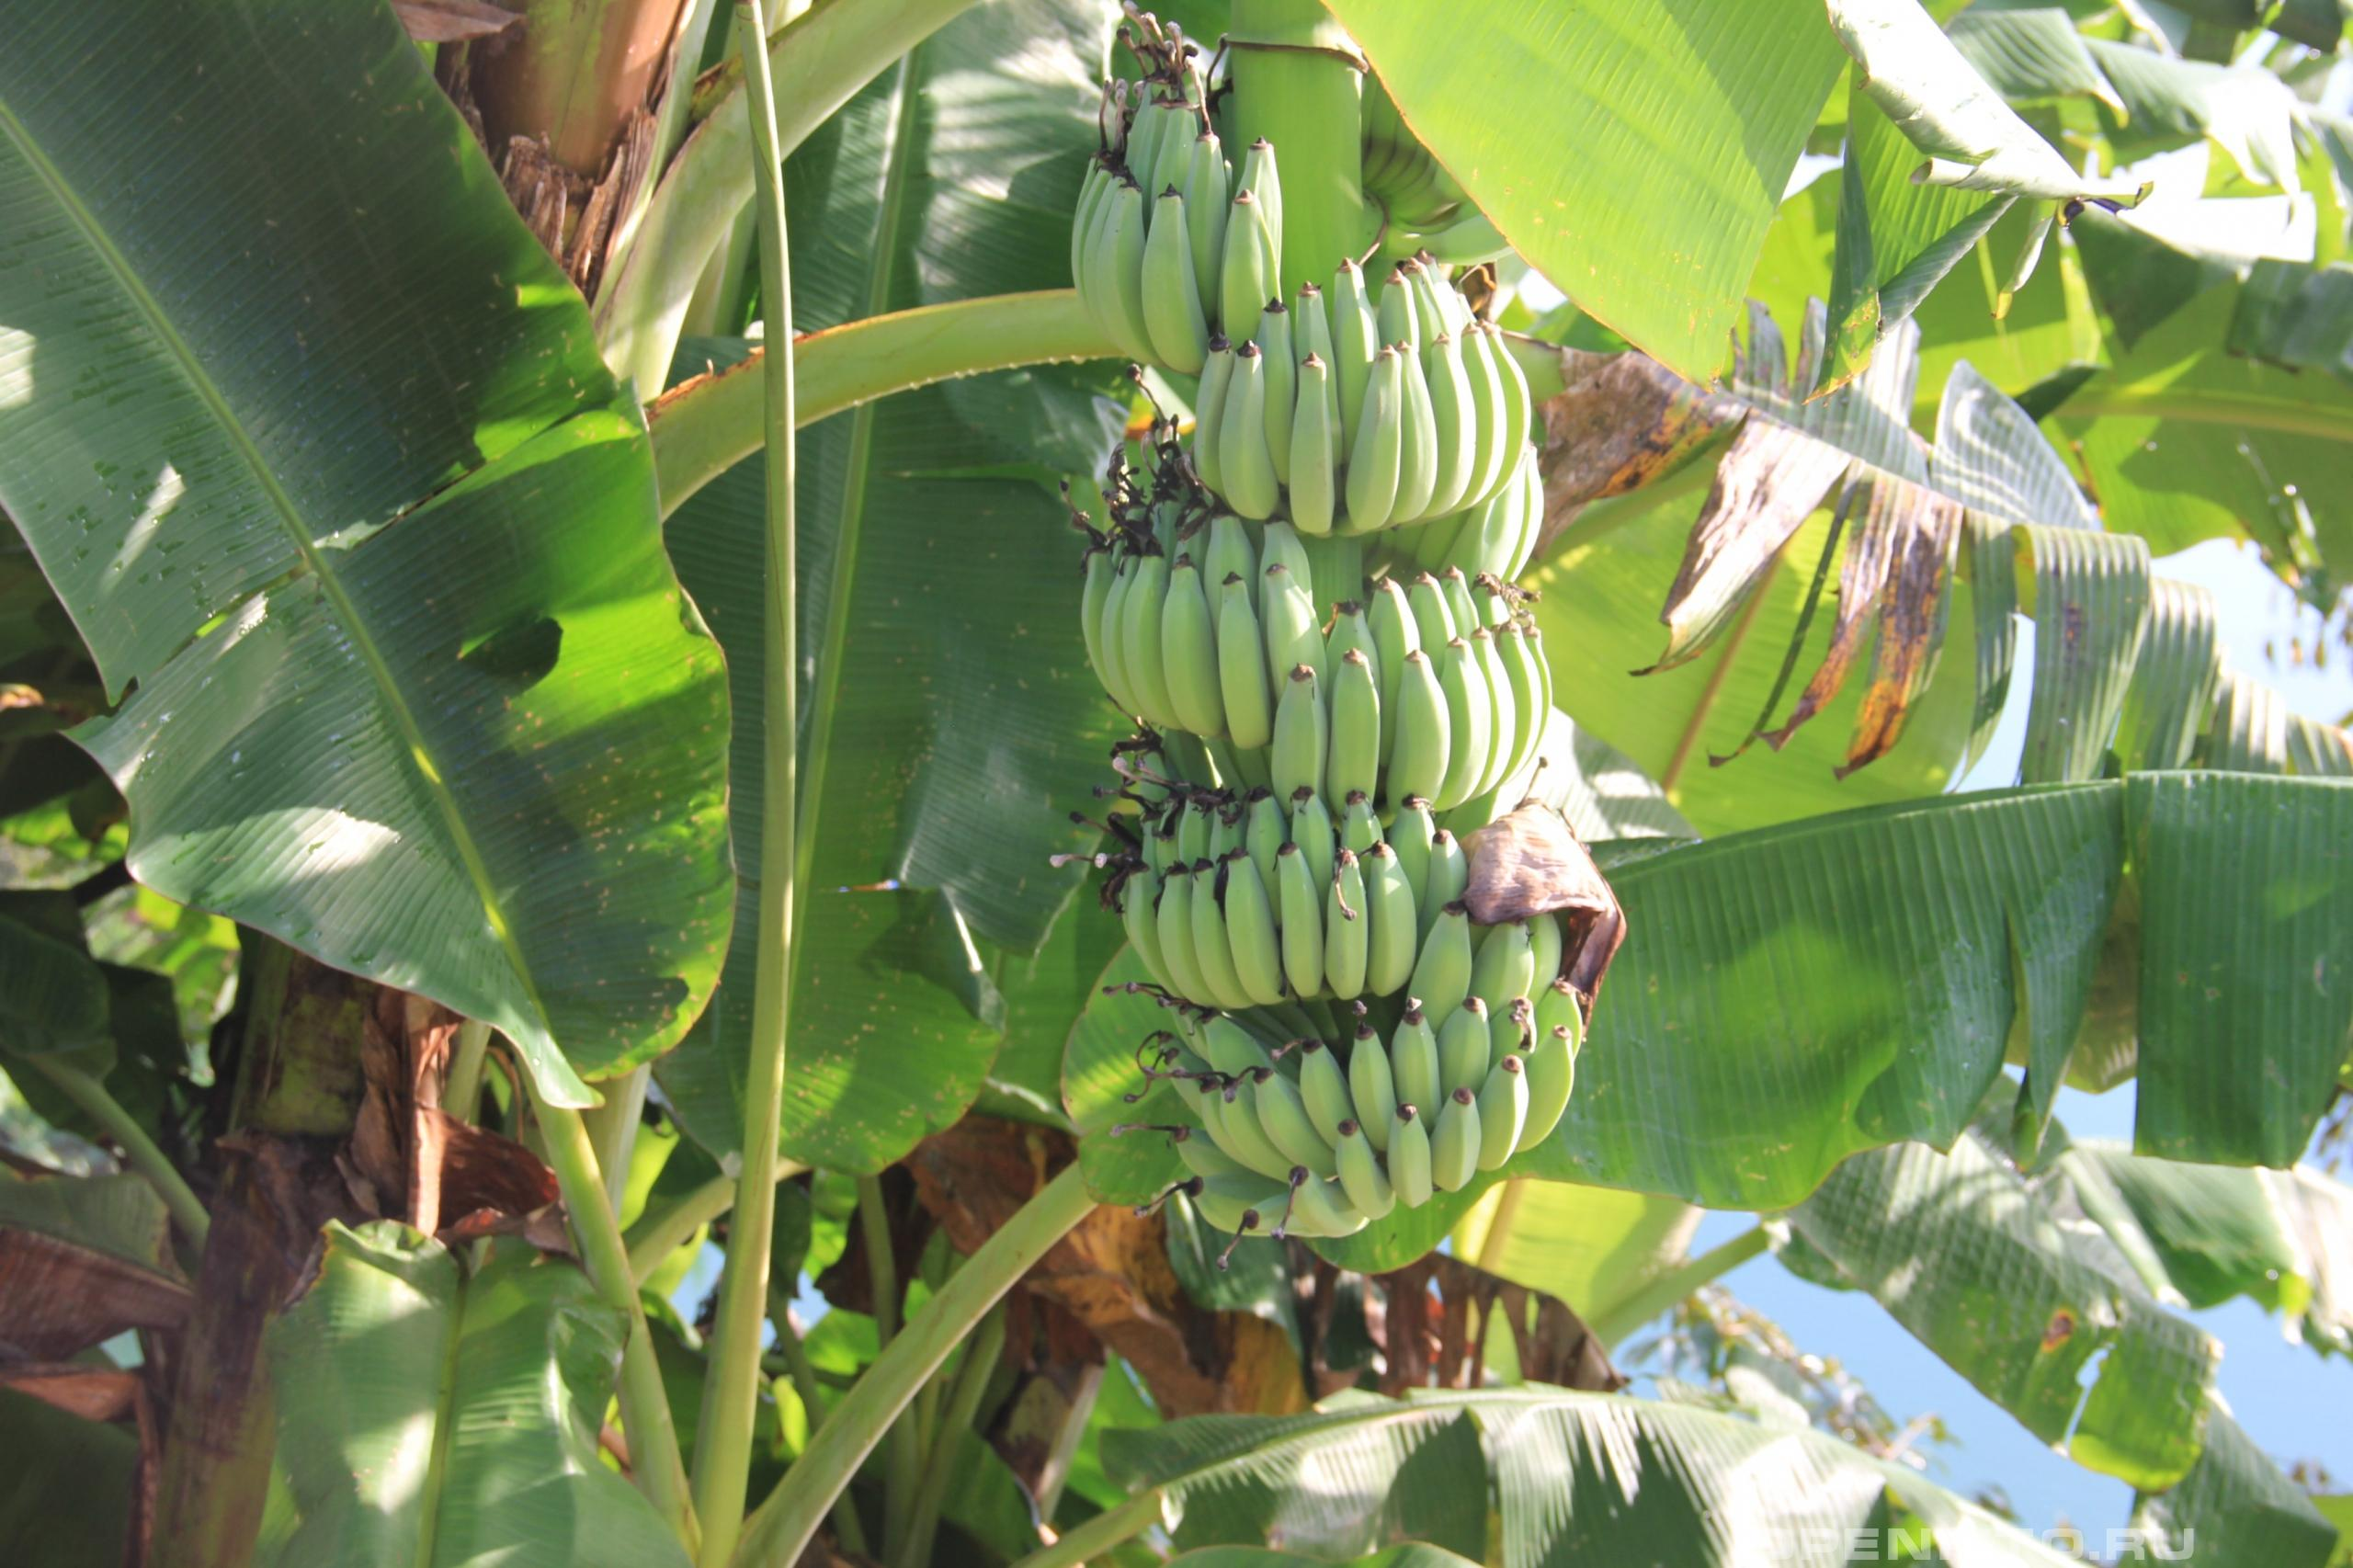 Банан японский съедобный вид бананов из азии